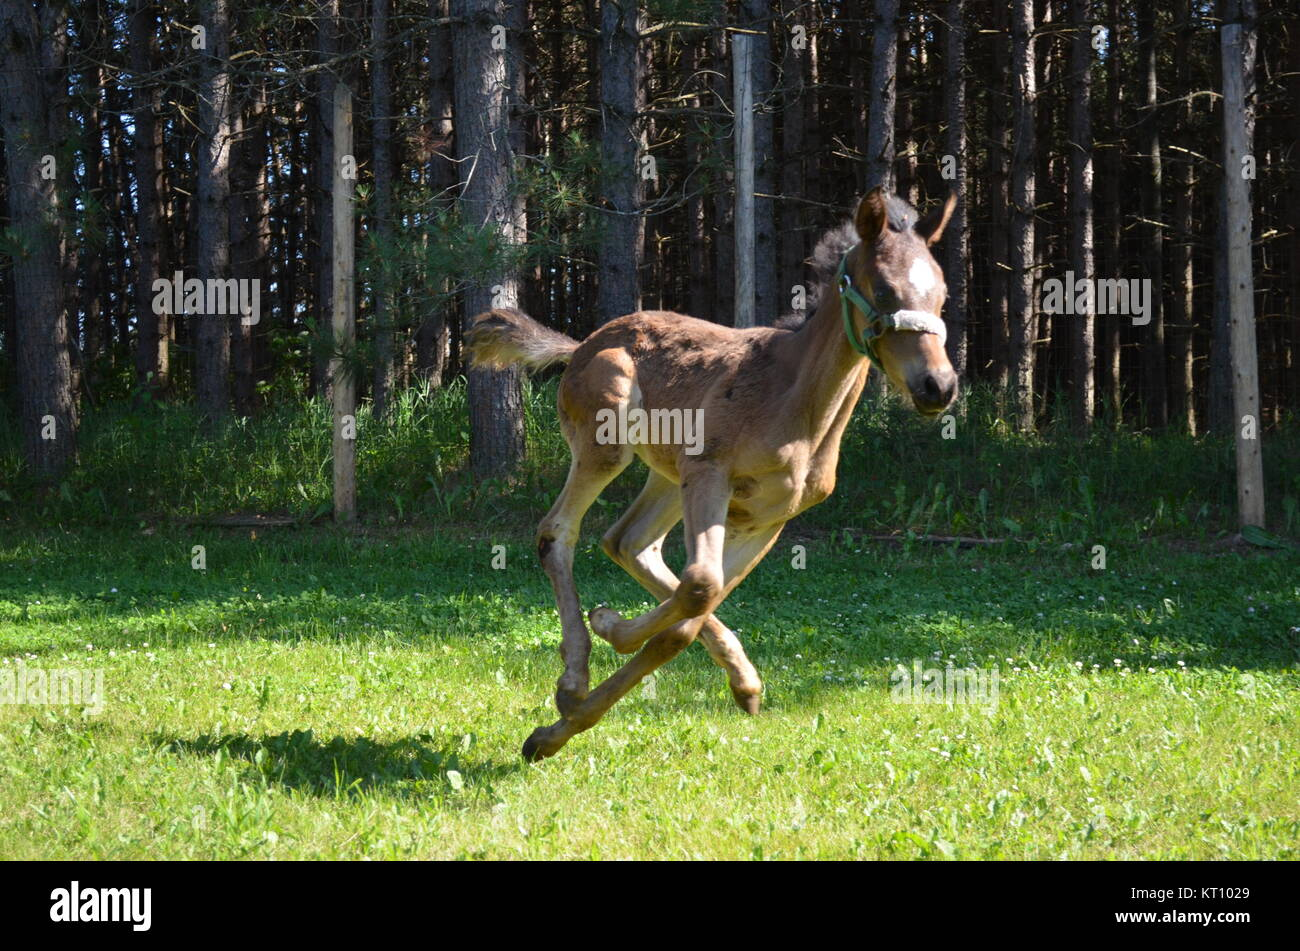 Foal - Stock Image